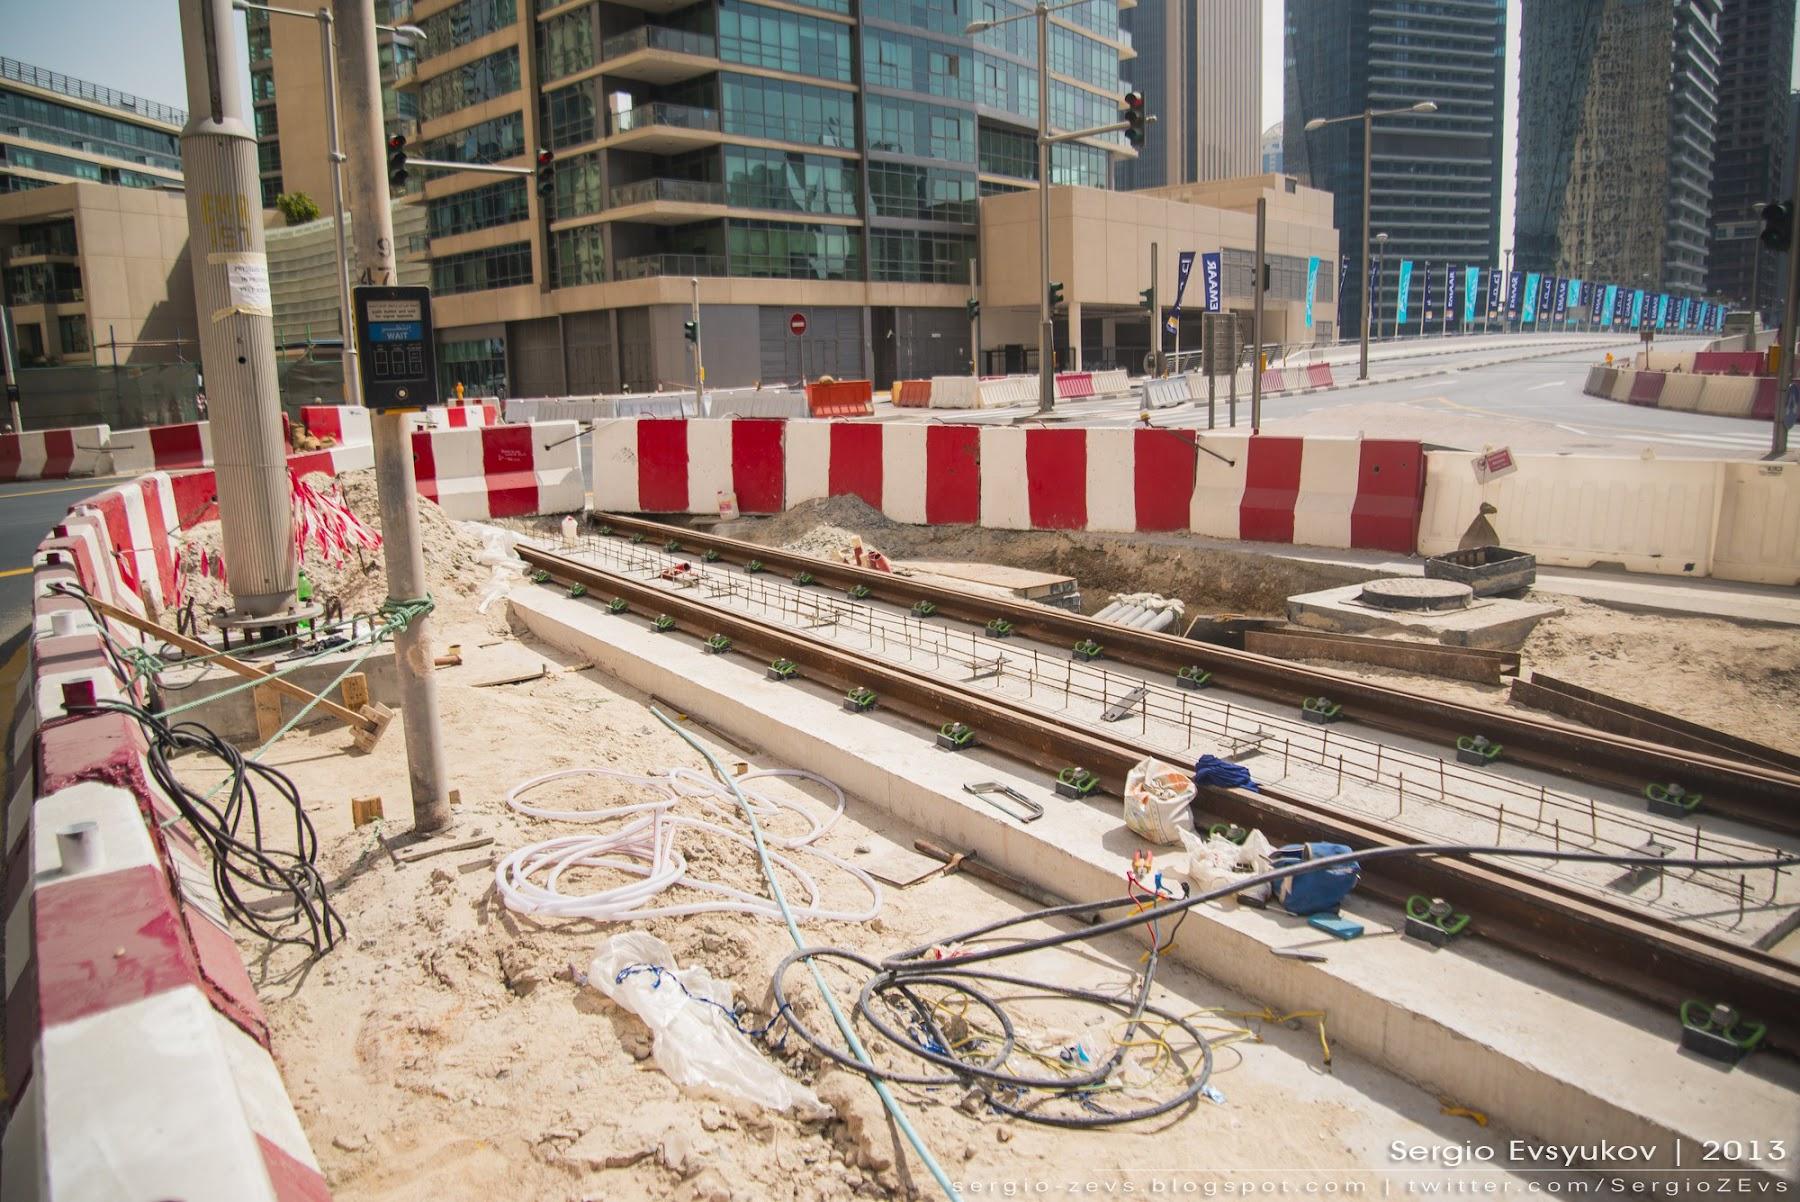 Tram in Dubai Marina